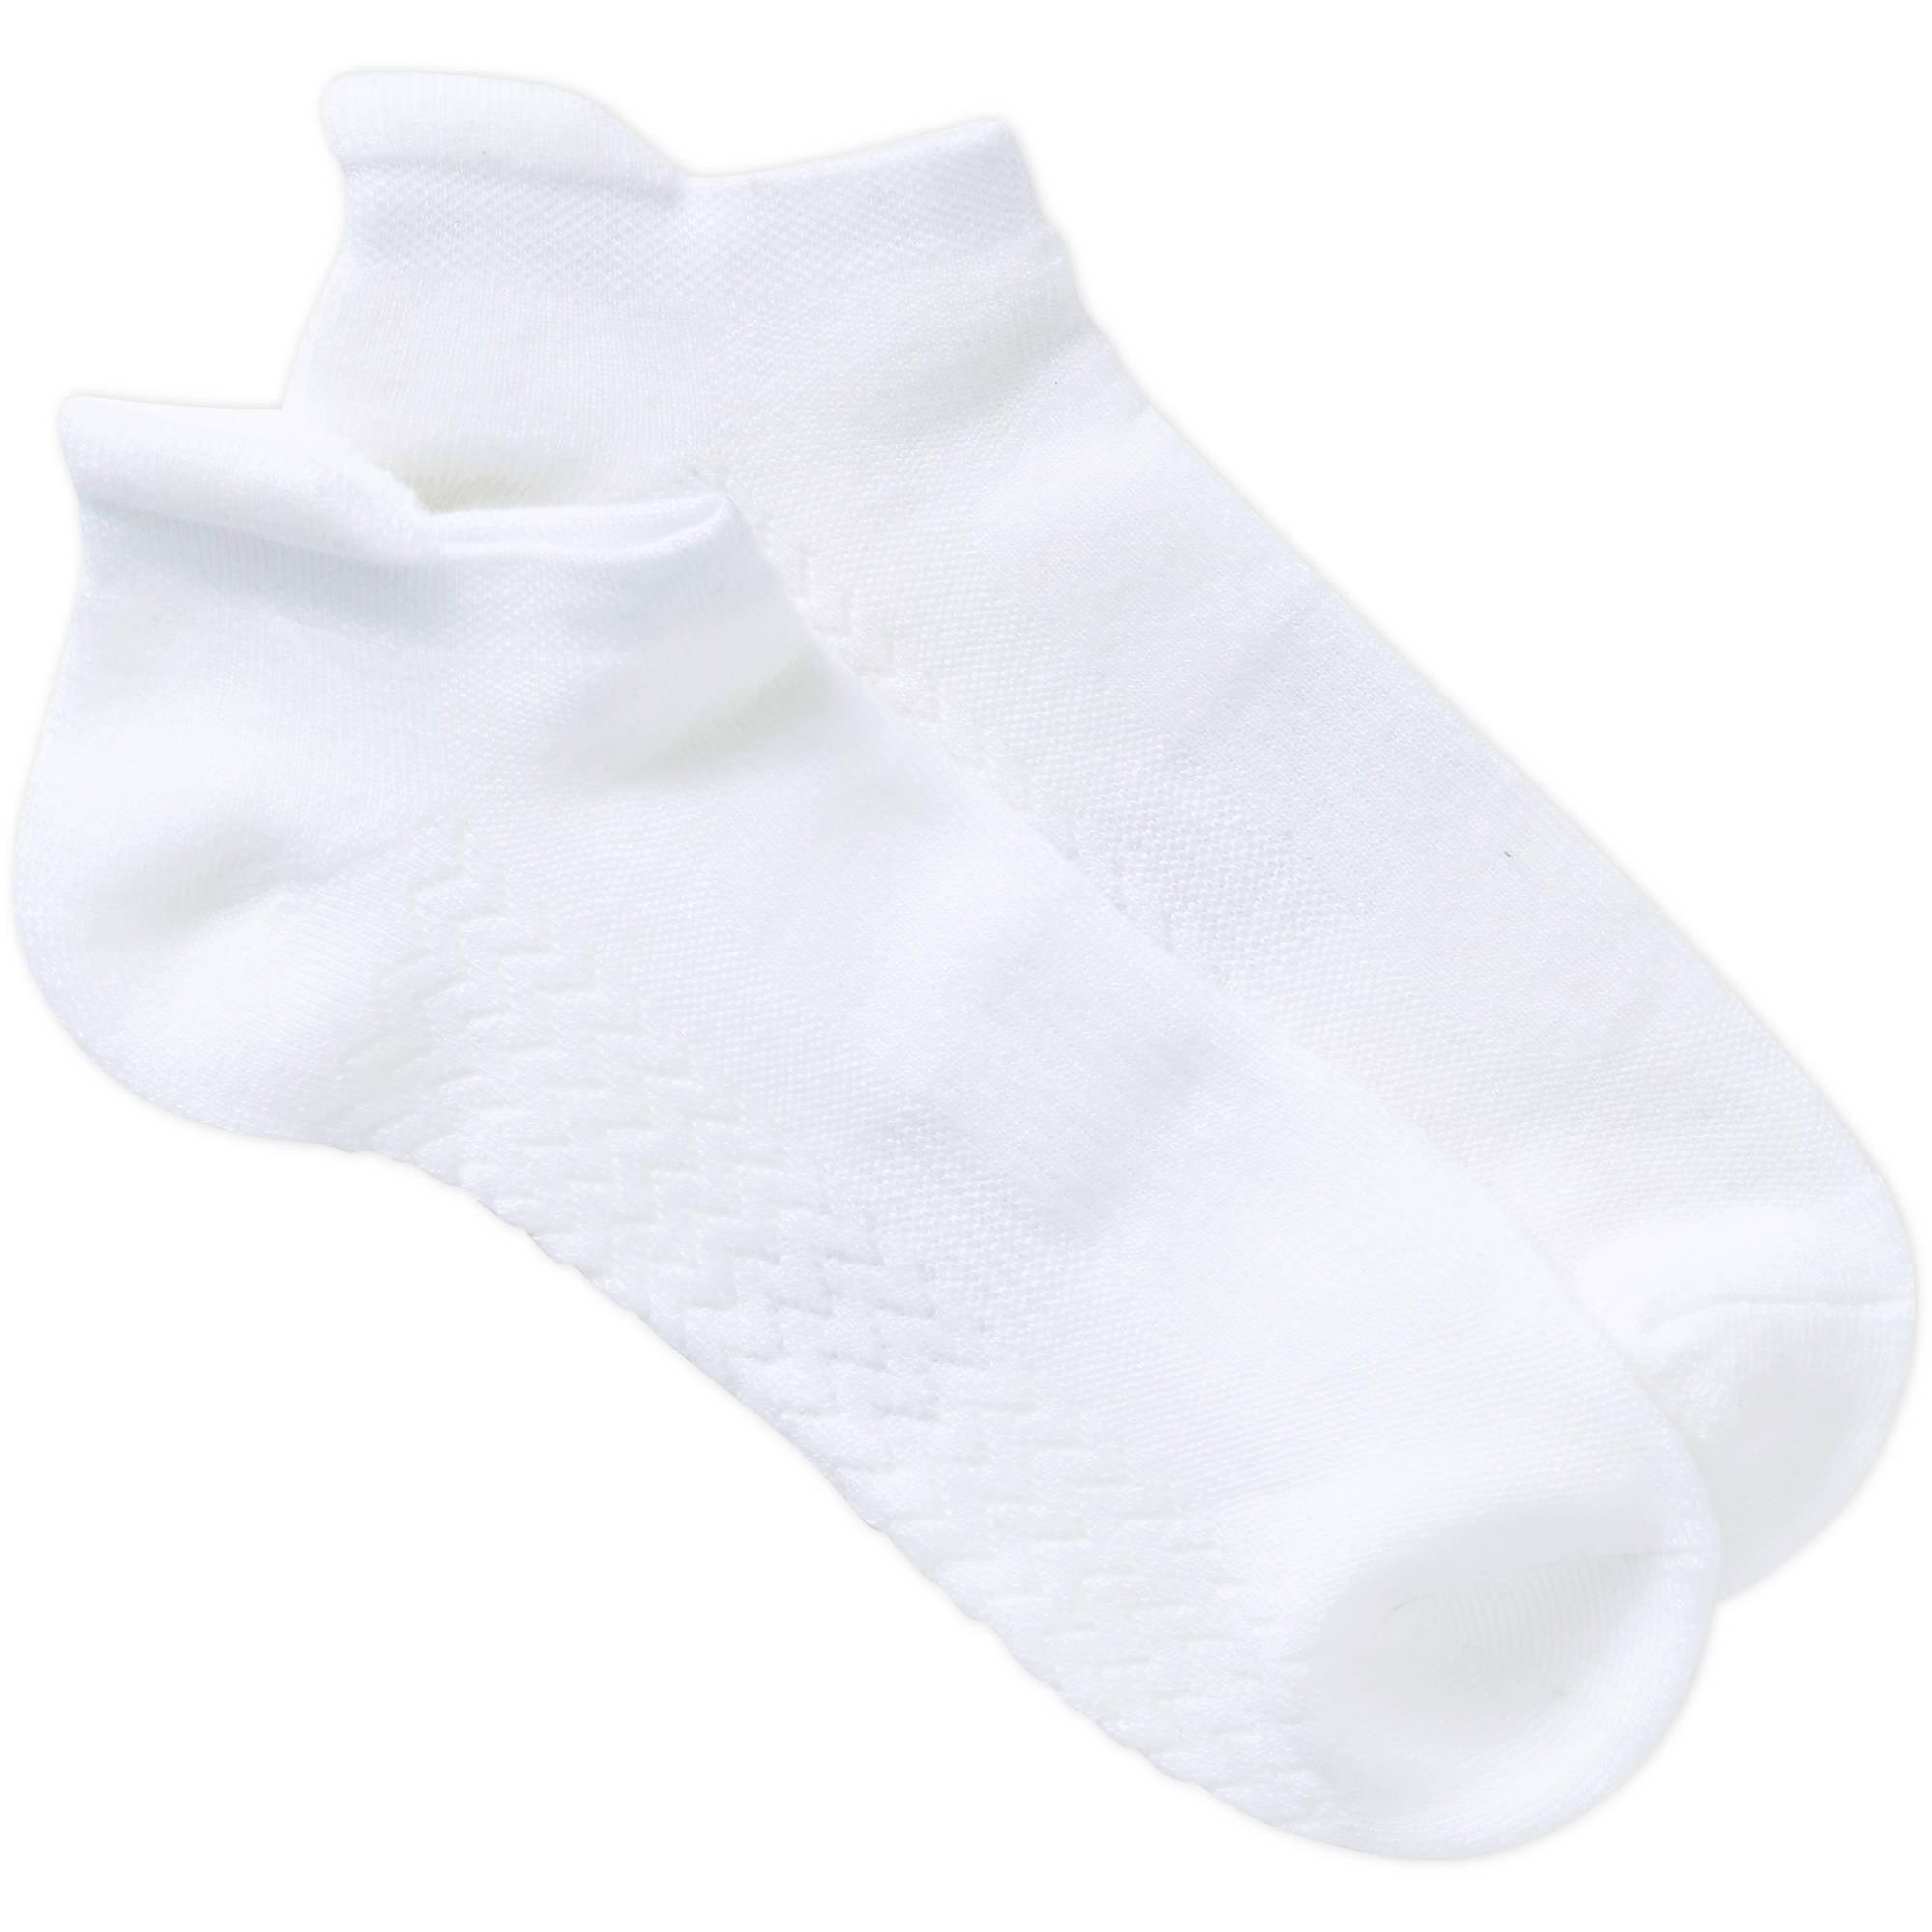 Ben Hogan 3 Pack Men's Ultra Comfort No Show Performance Sock